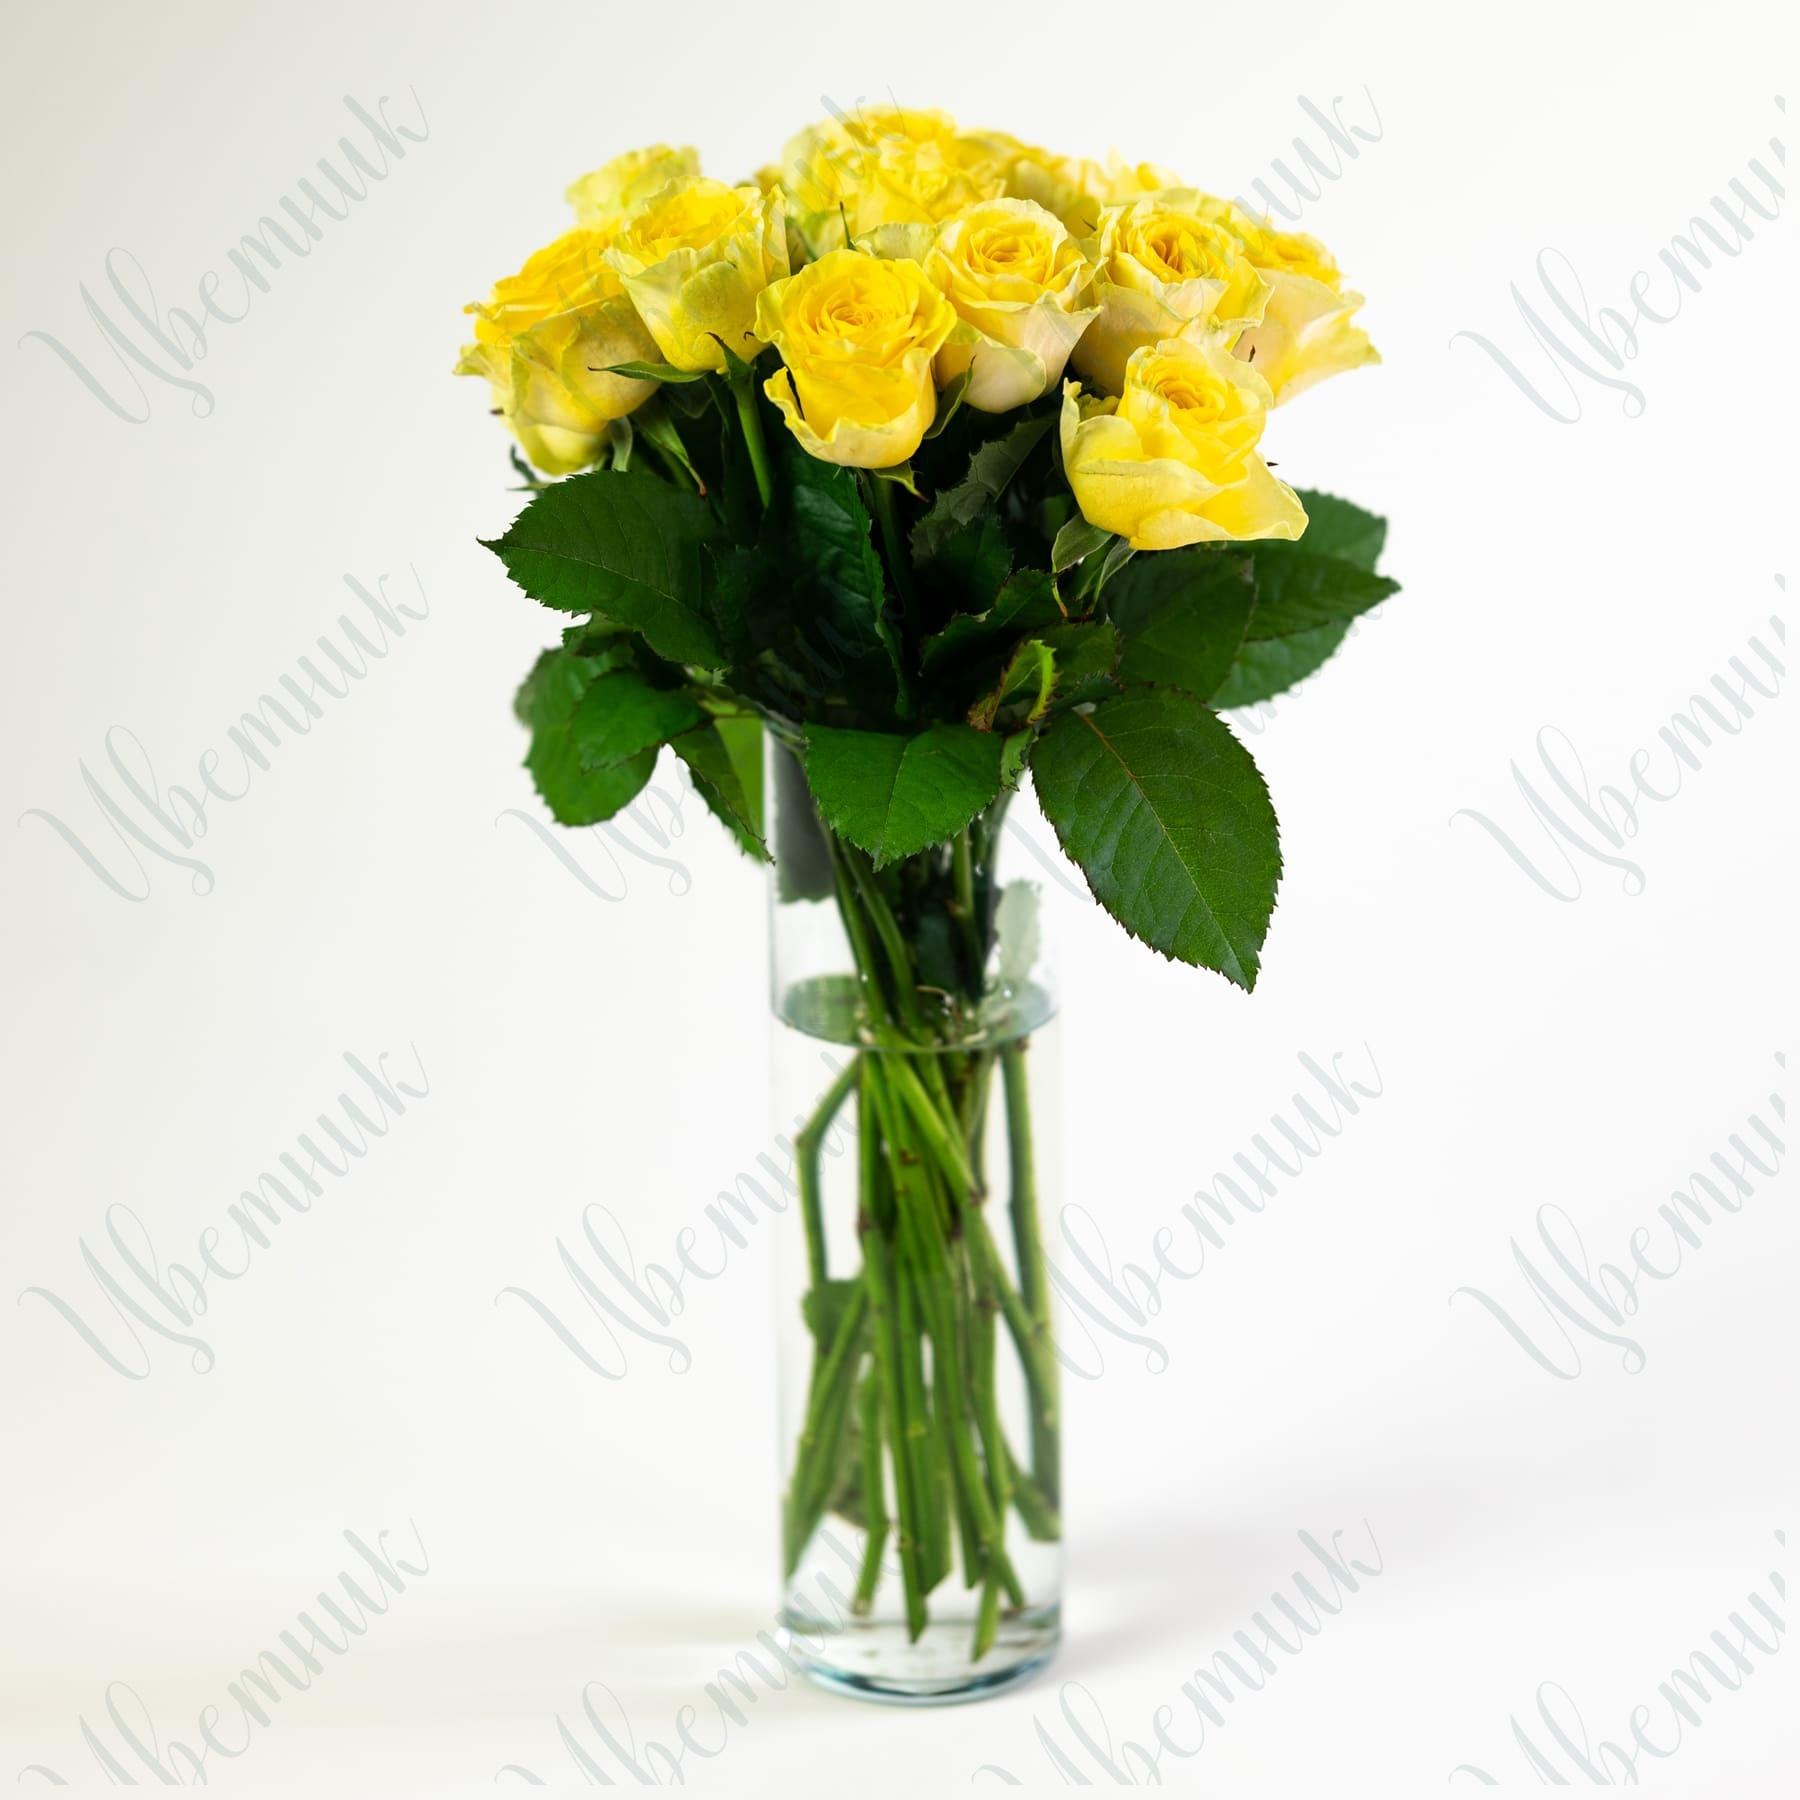 Роза Илиос 50-60 см 1 шт.